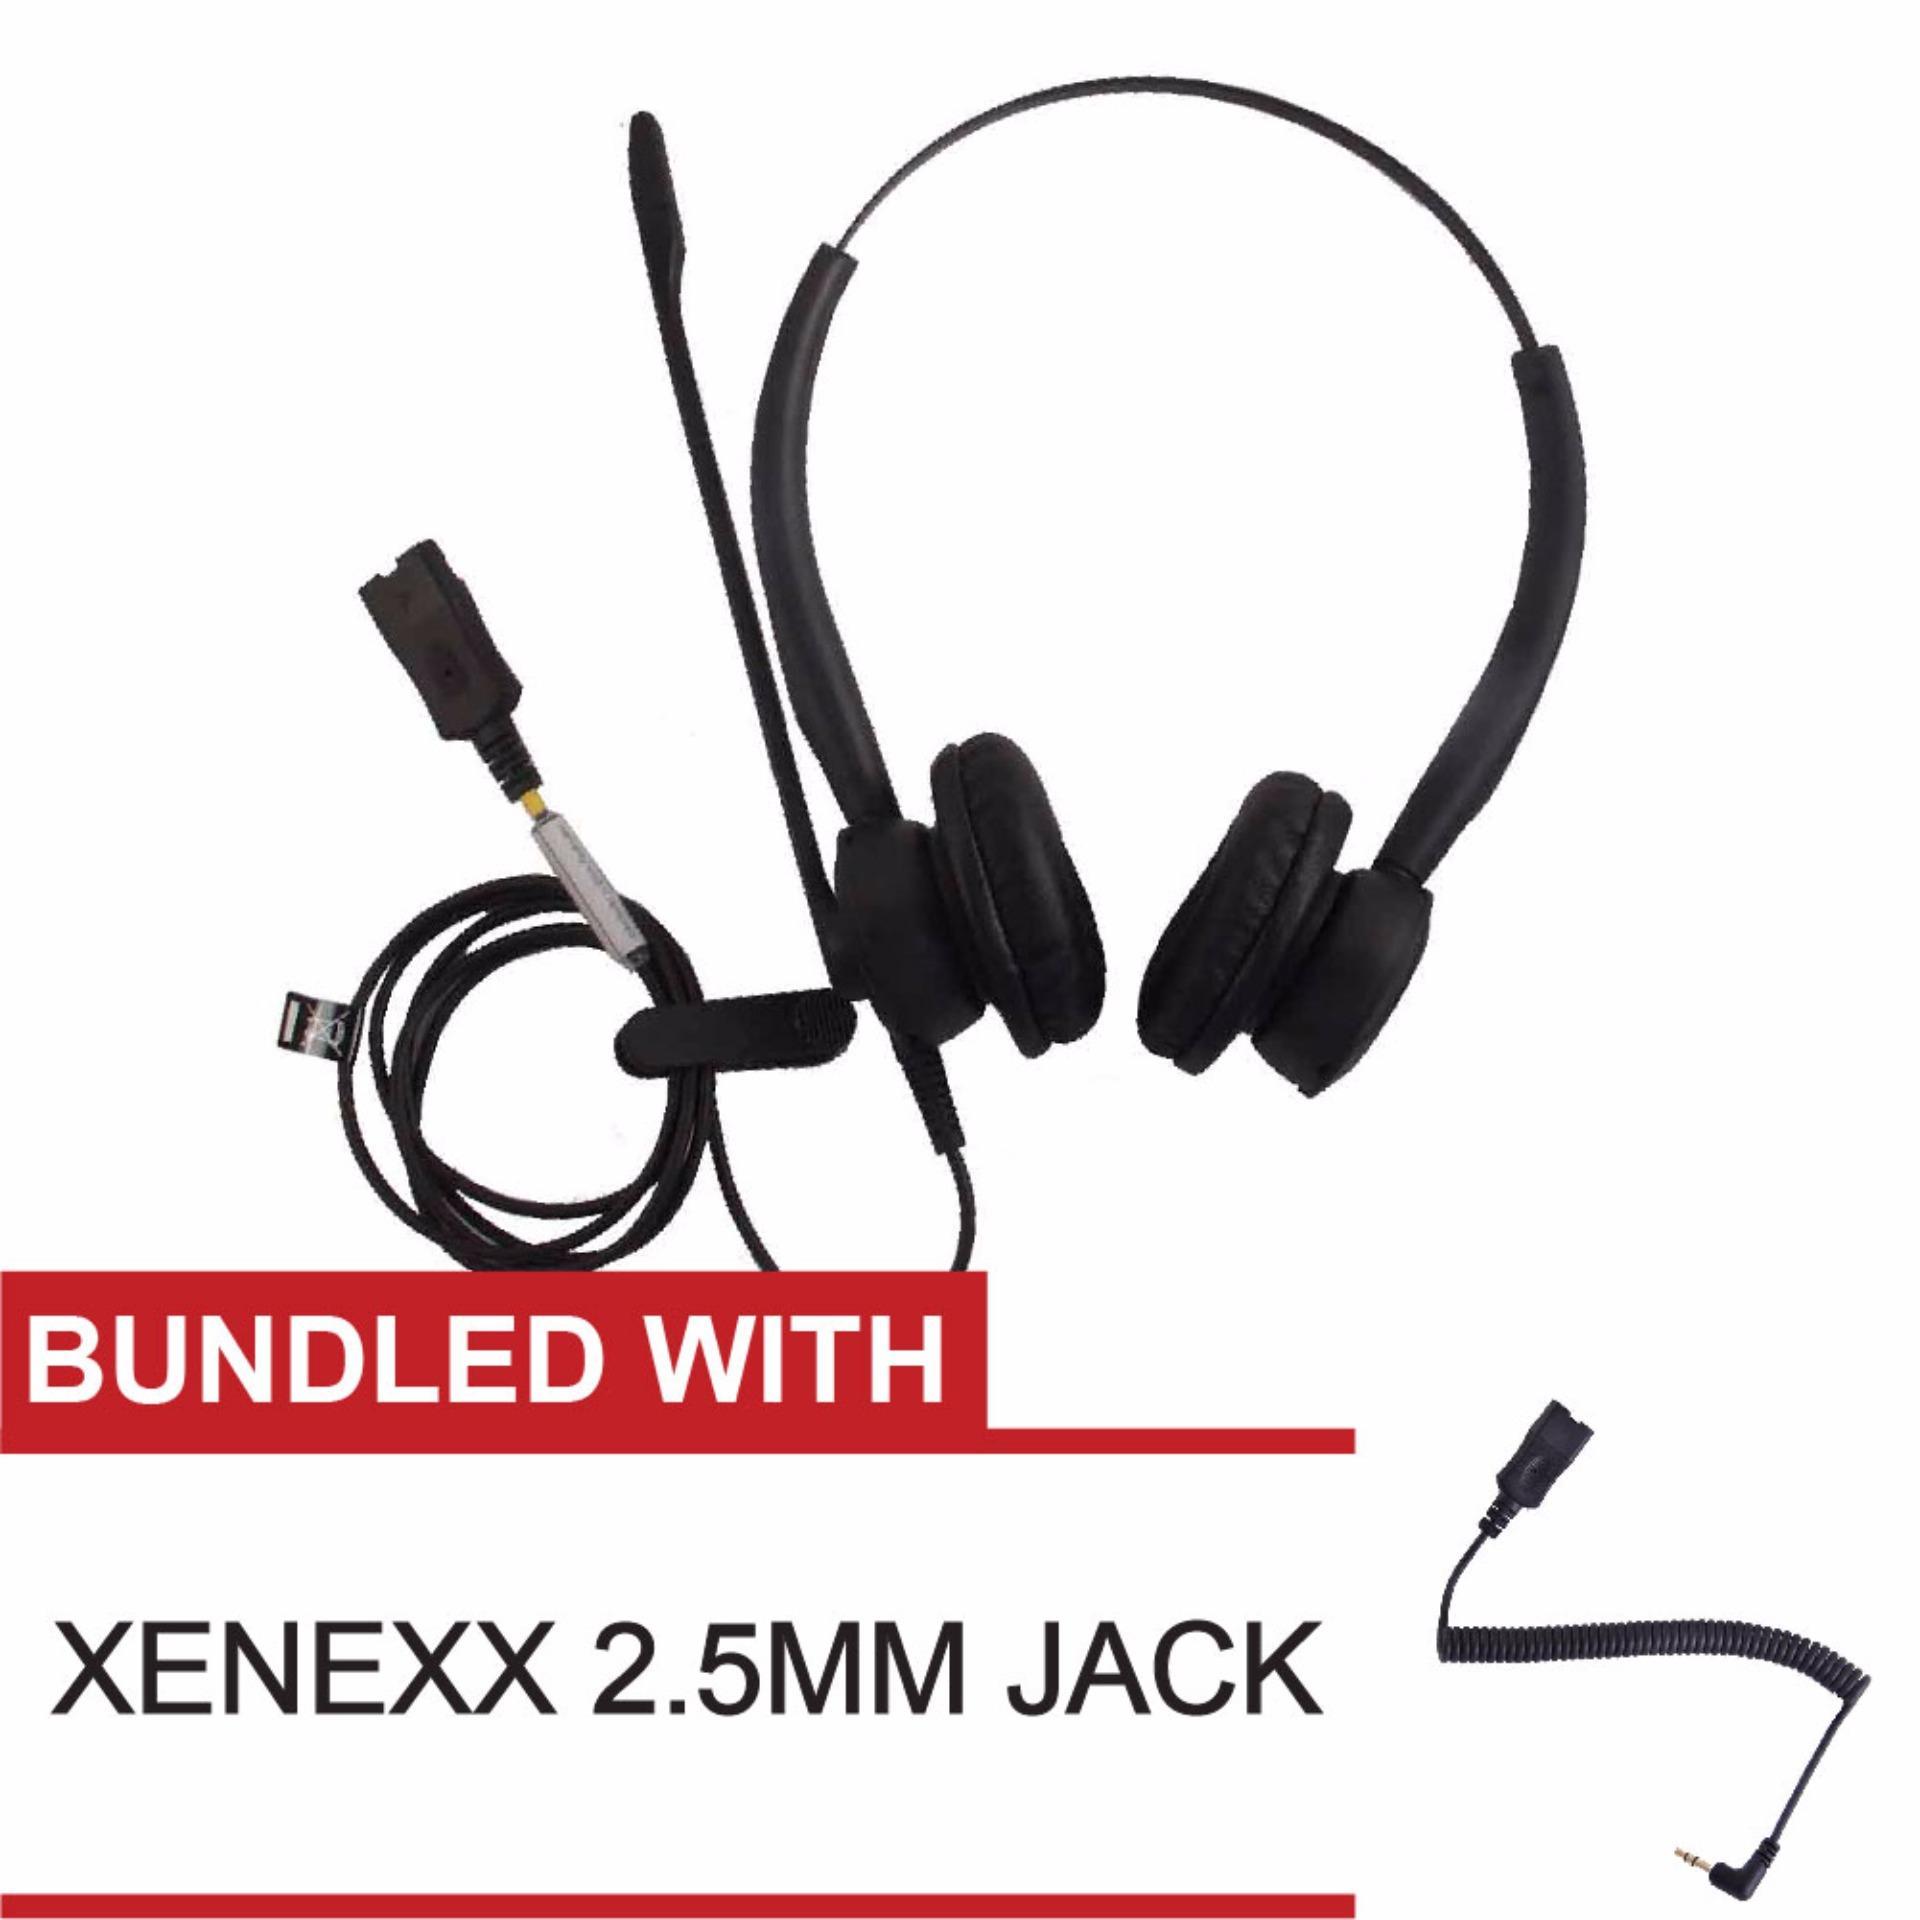 ... Xenexx 825 Binaural Duo Noise-Cancelling Call Center Headset withXenexx XX 2.5mm 3- ...